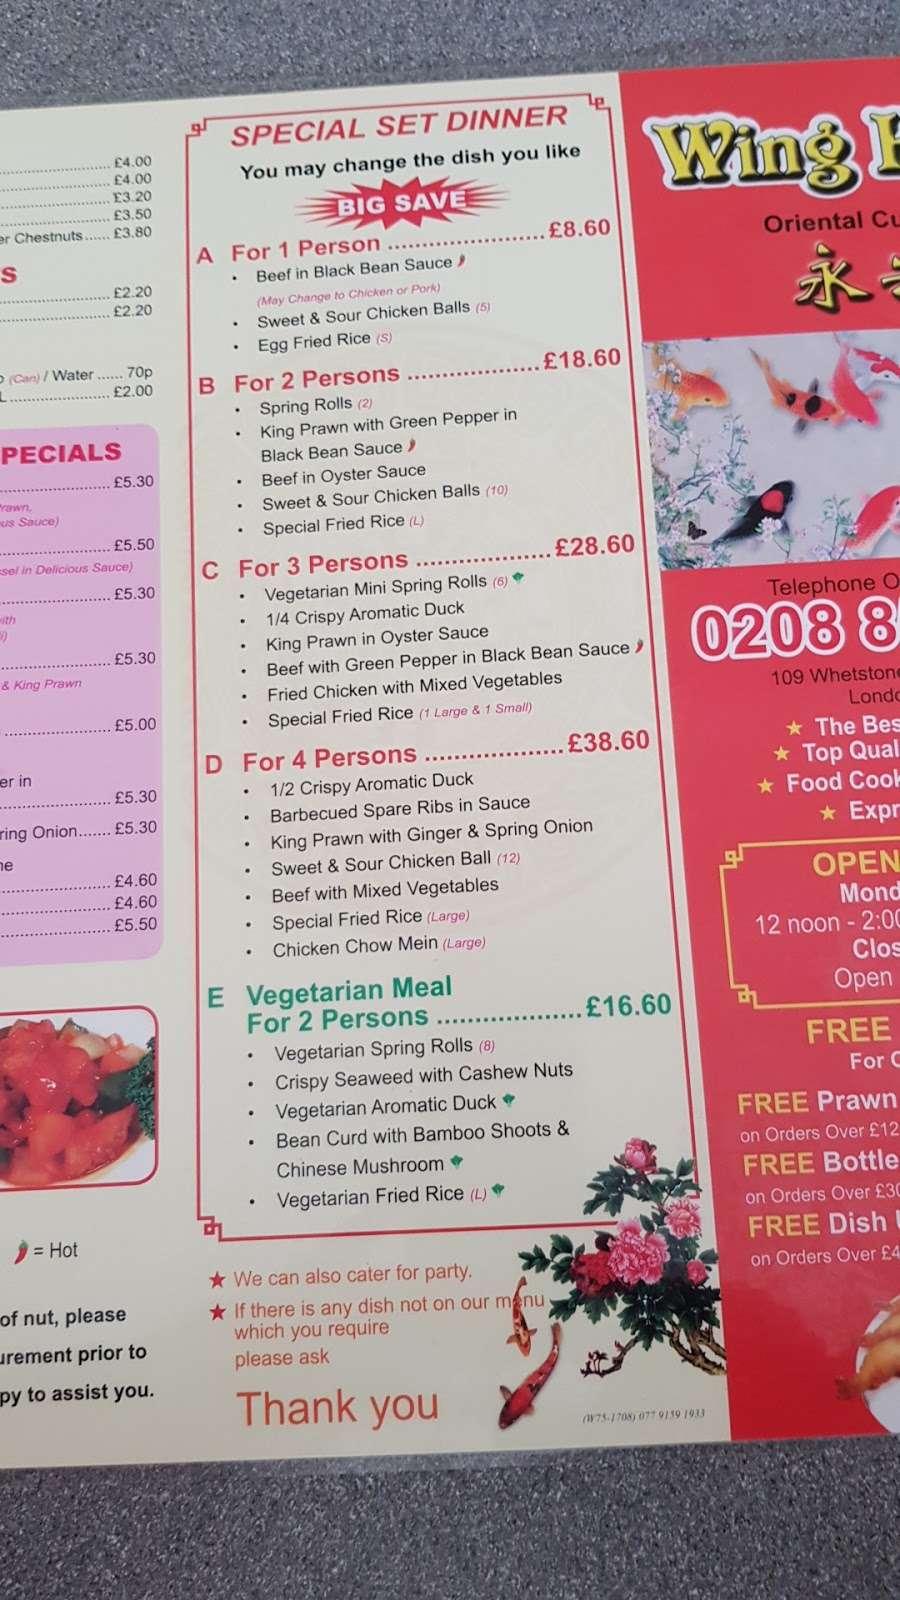 Wing Hing - meal takeaway  | Photo 6 of 7 | Address: 109 Whetstone Rd, London SE3 8QA, UK | Phone: 020 8856 9370